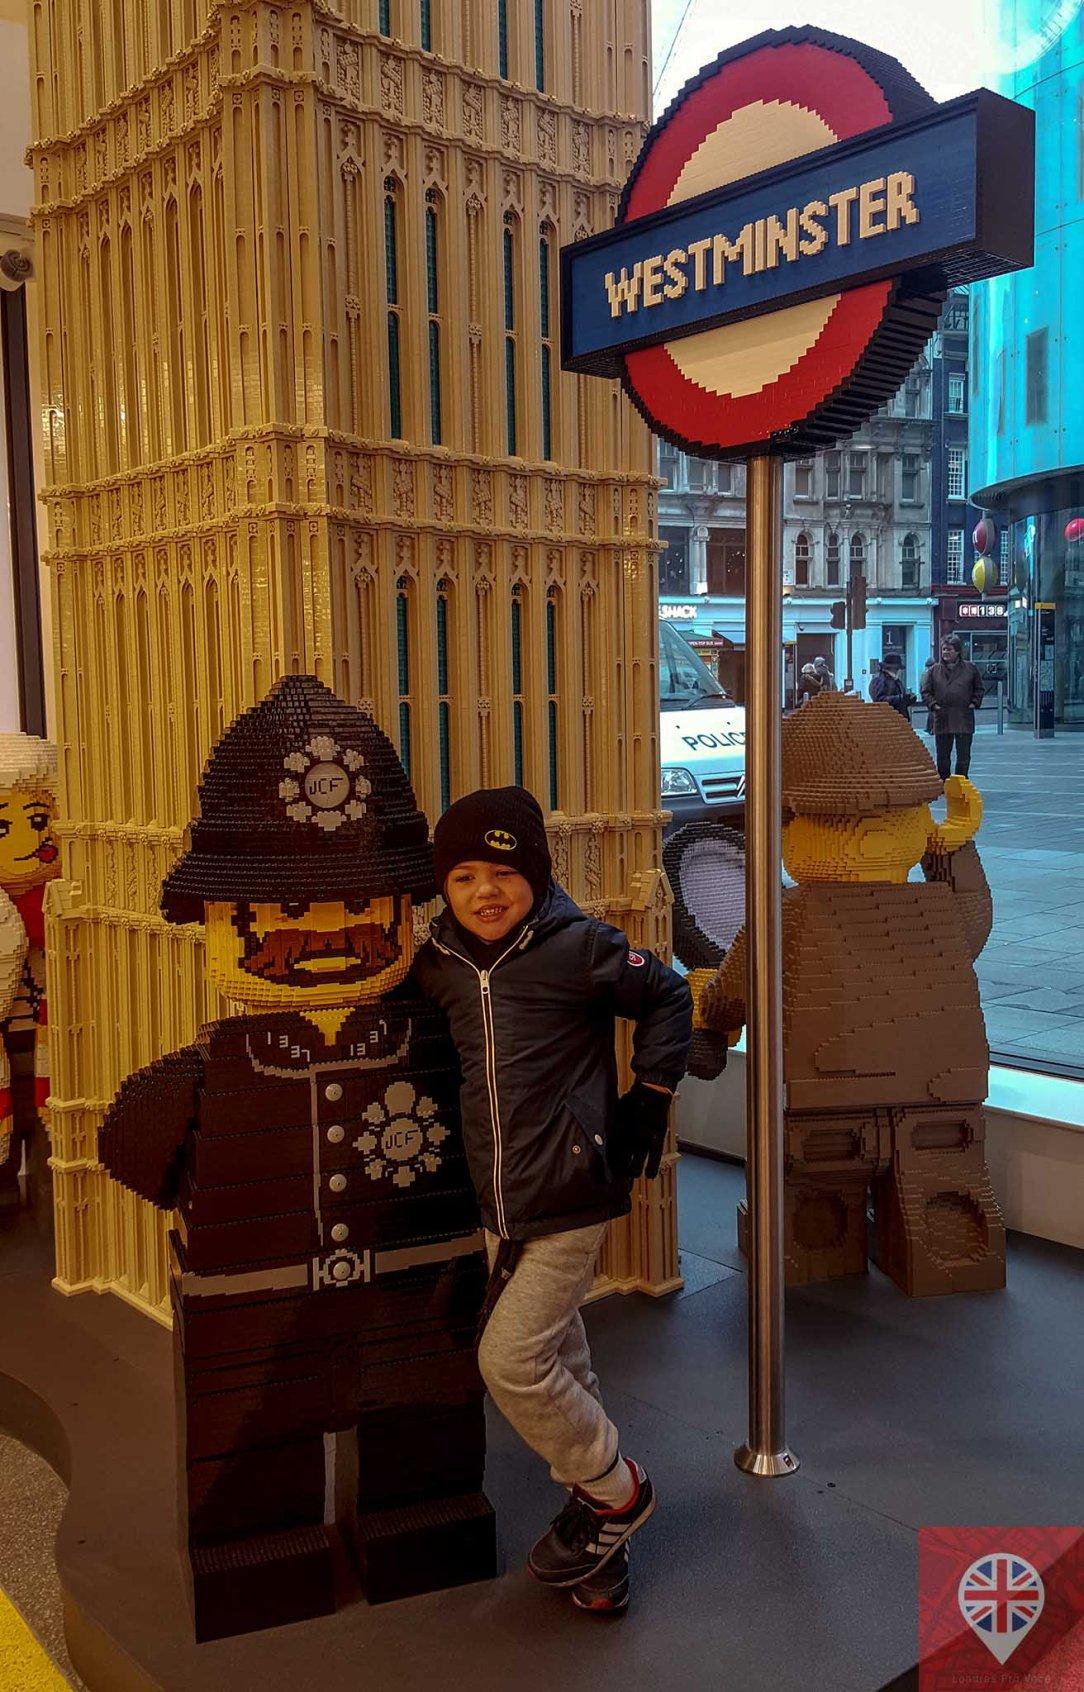 Lego store policeman